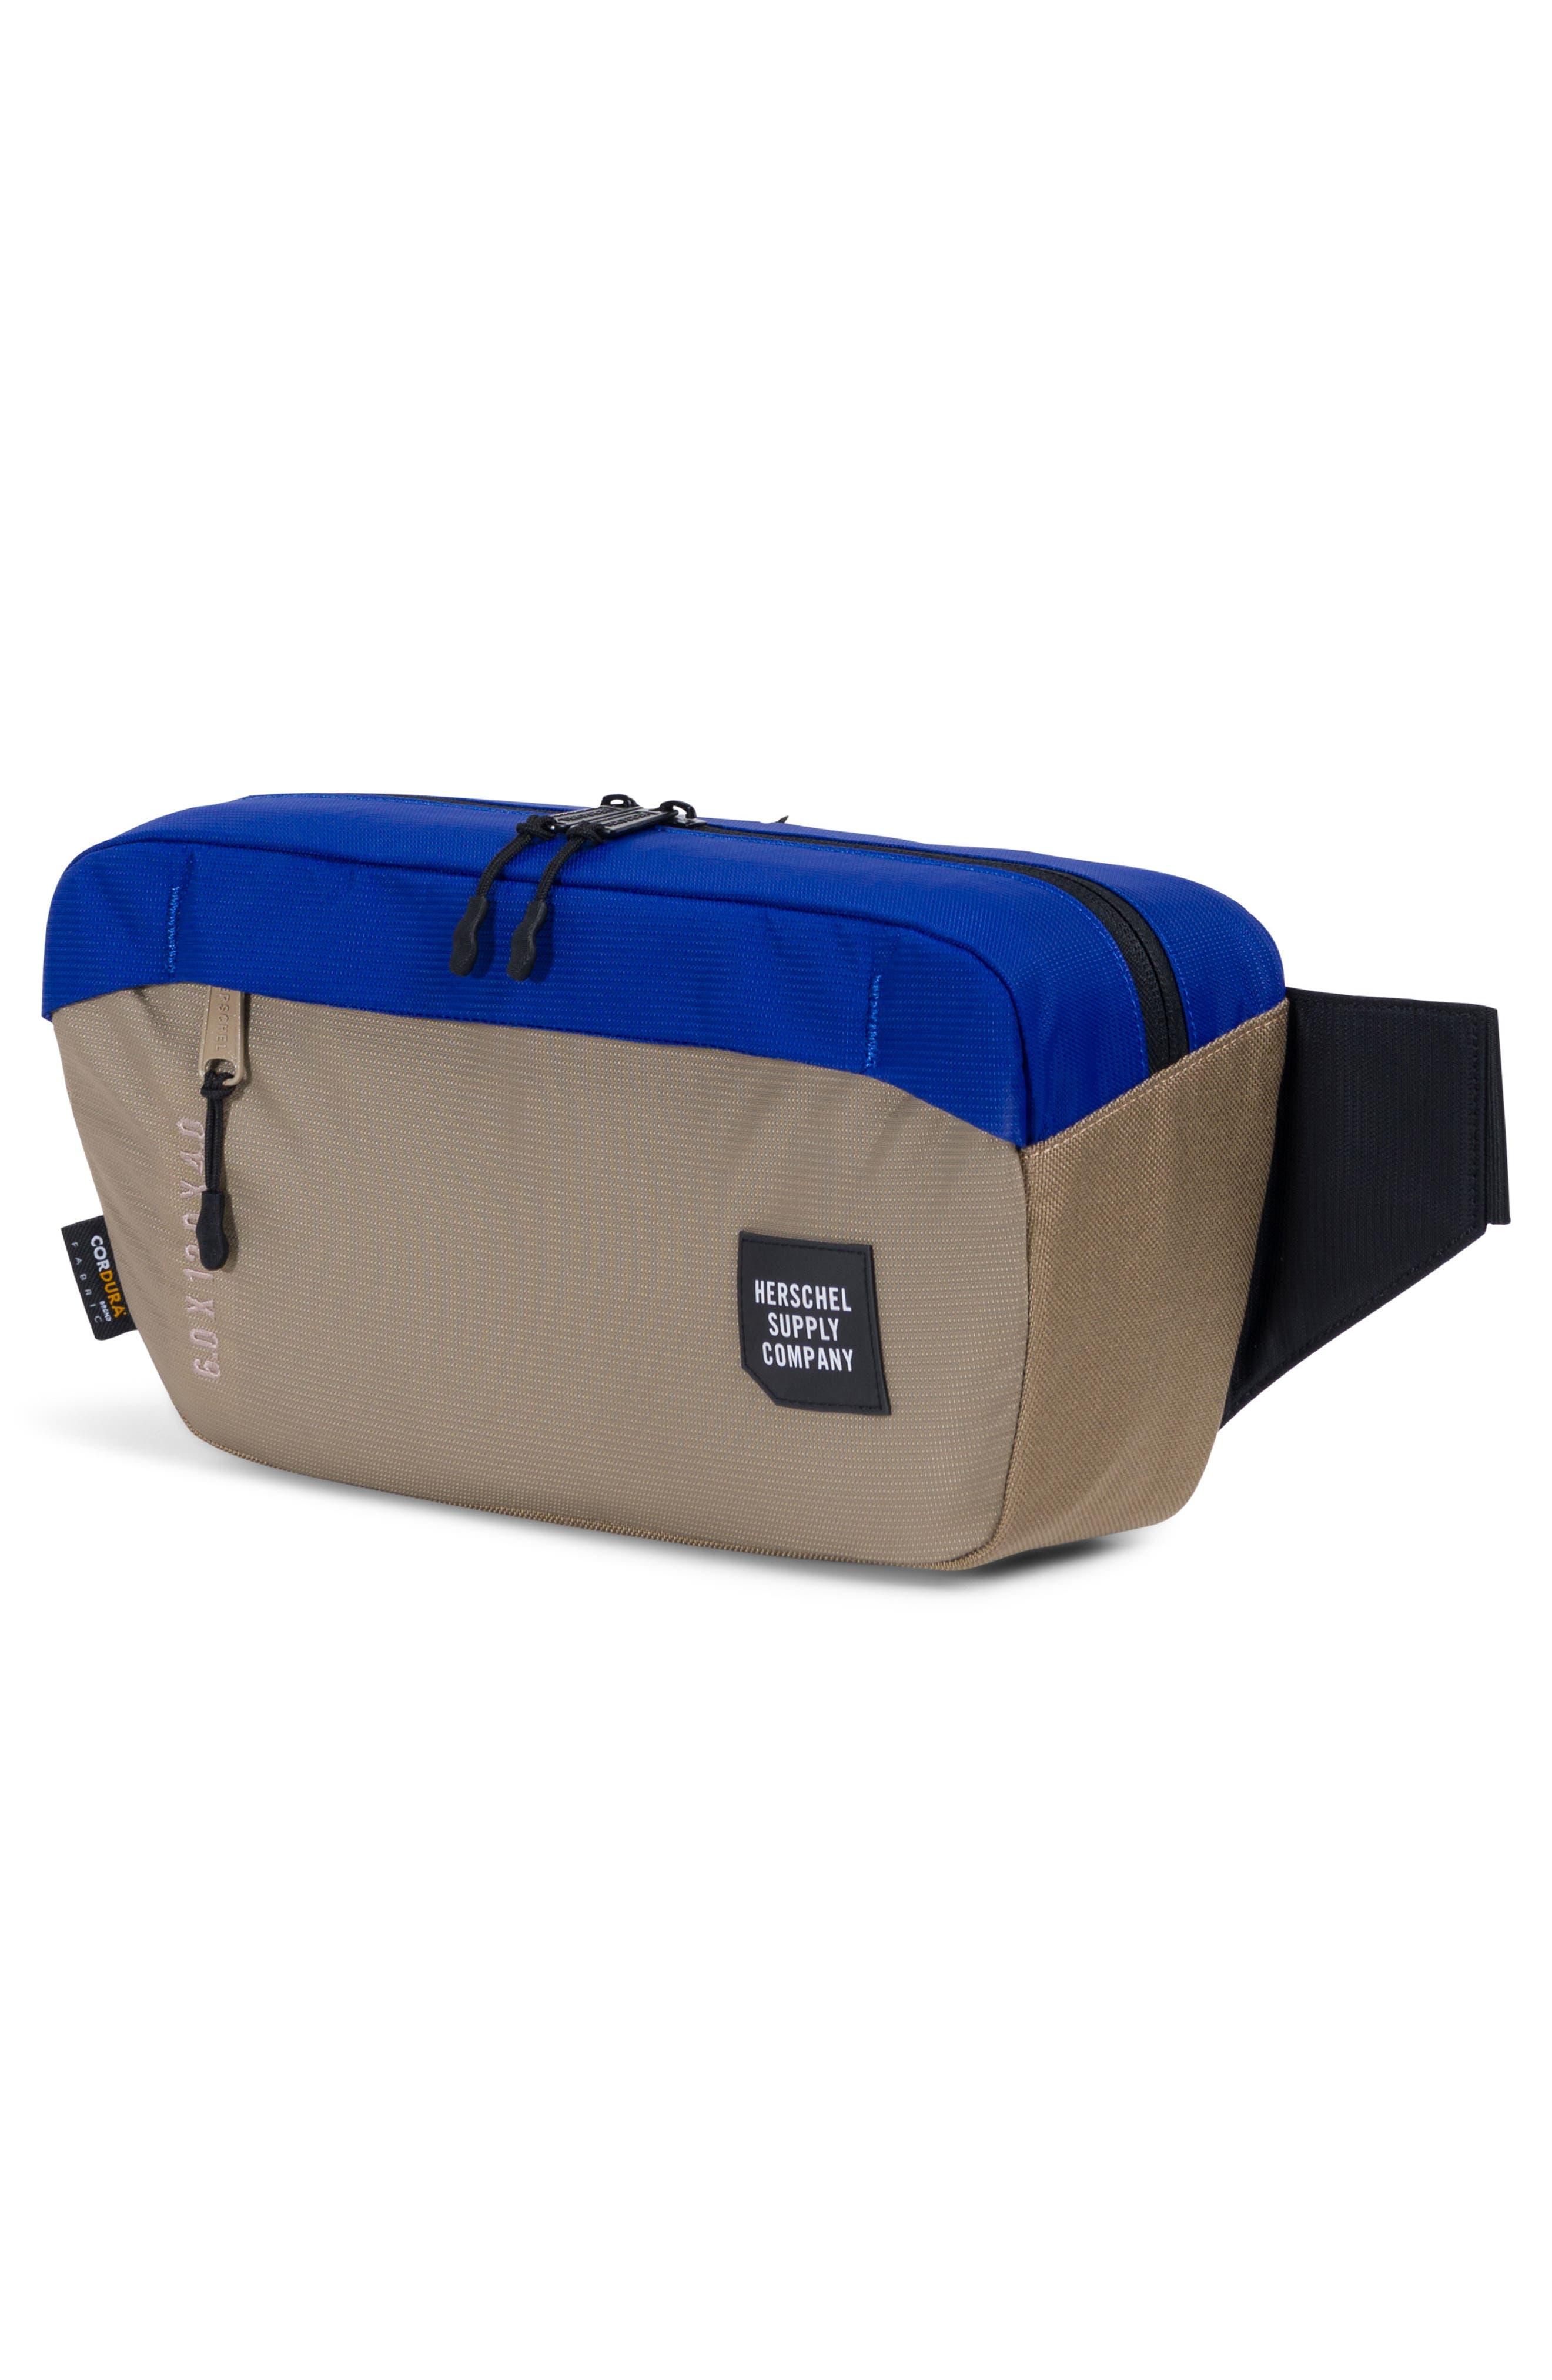 Alternate Image 3  - Herschel Supply Co. Tour Trail Belt Bag